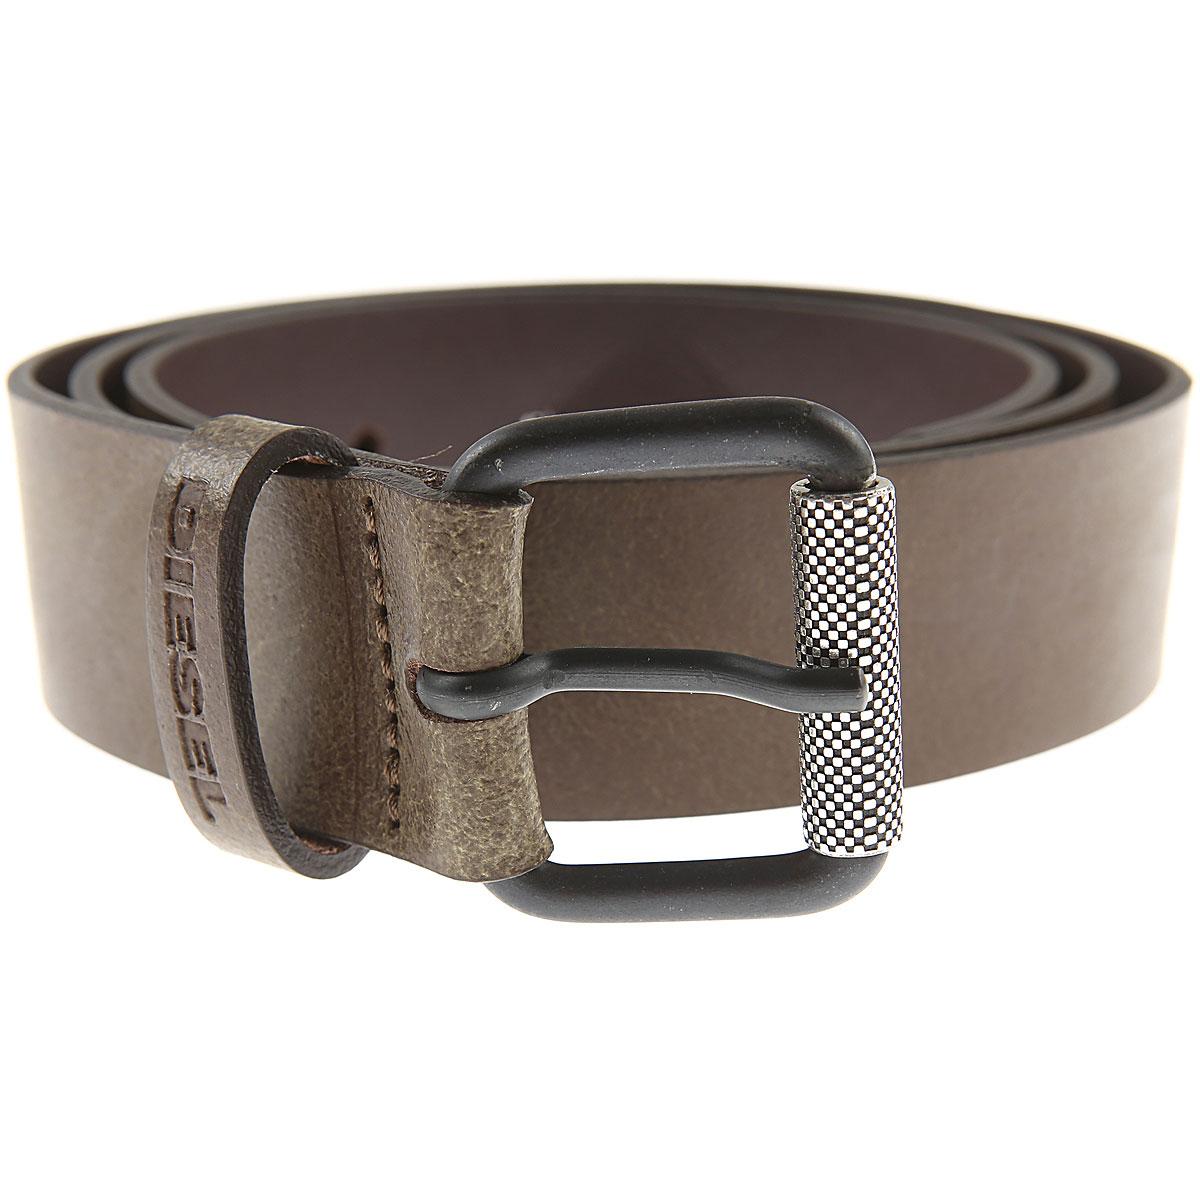 Diesel Mens Belts On Sale, Brown, Cow Leather, 2019, 36 38 42